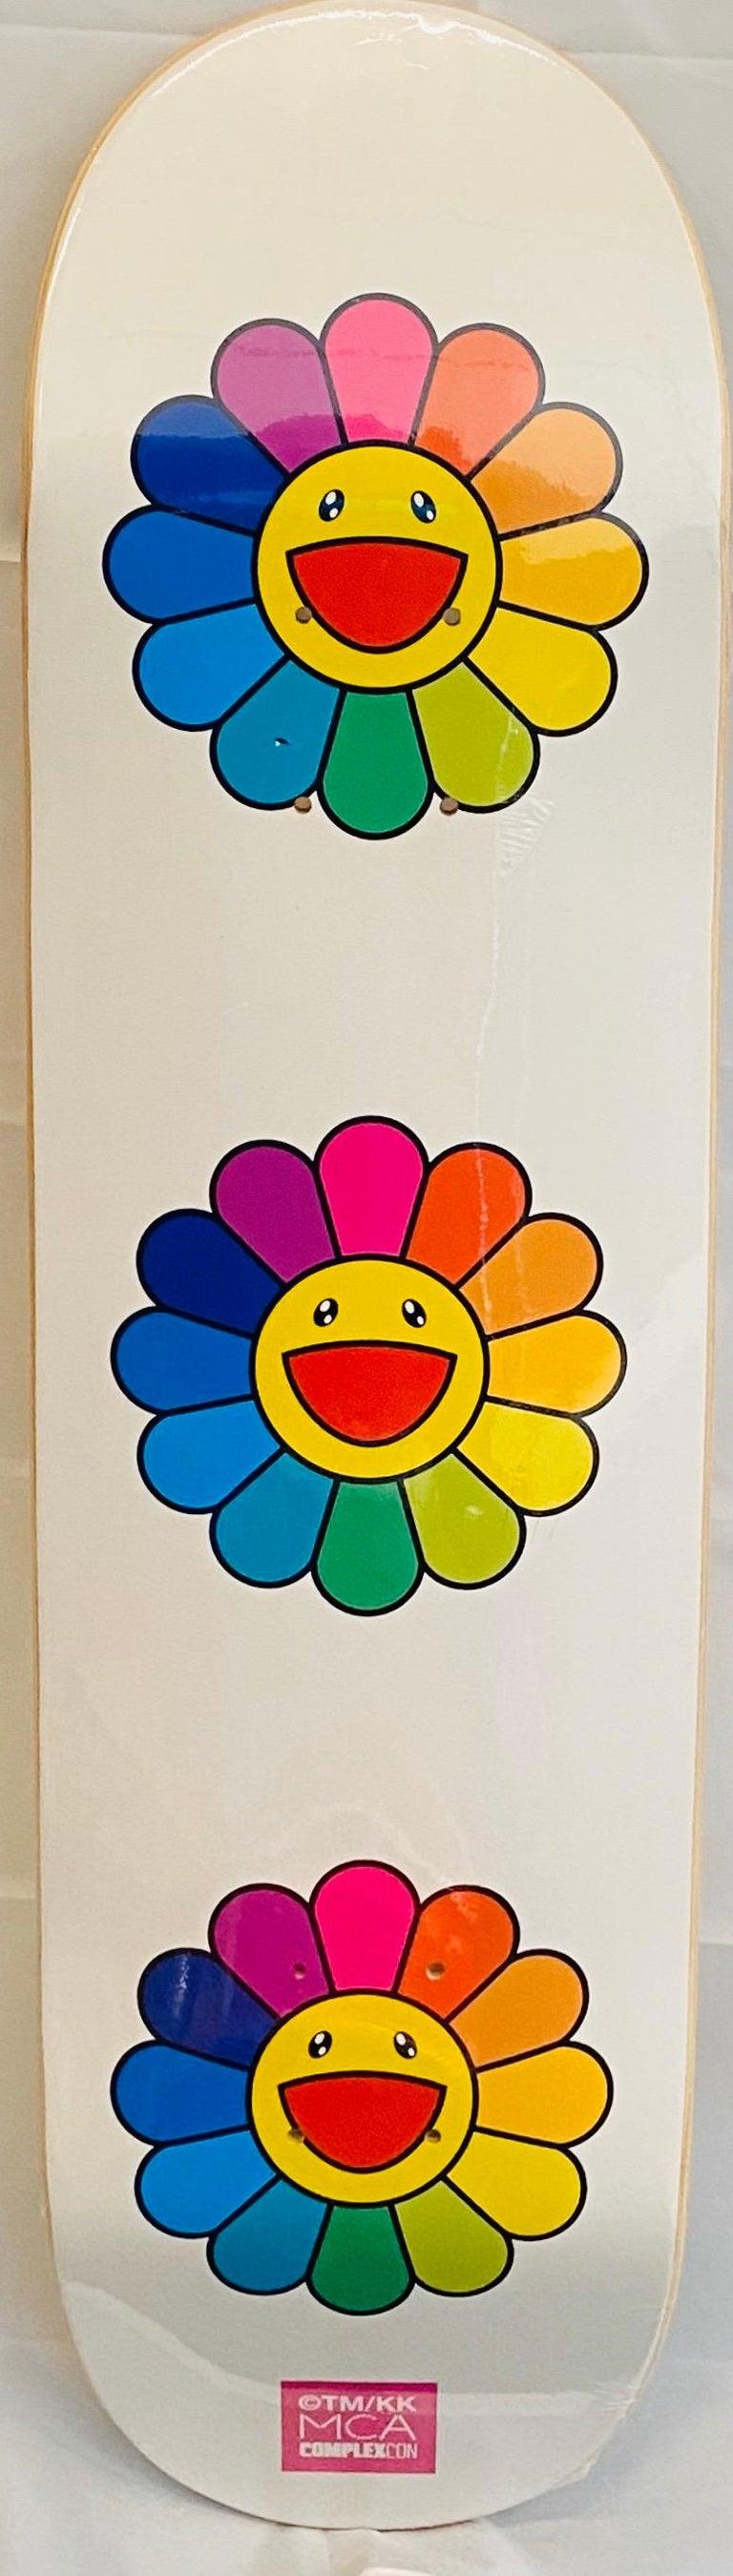 Murakami Flowers Skateboard Deck  - Print by Takashi Murakami